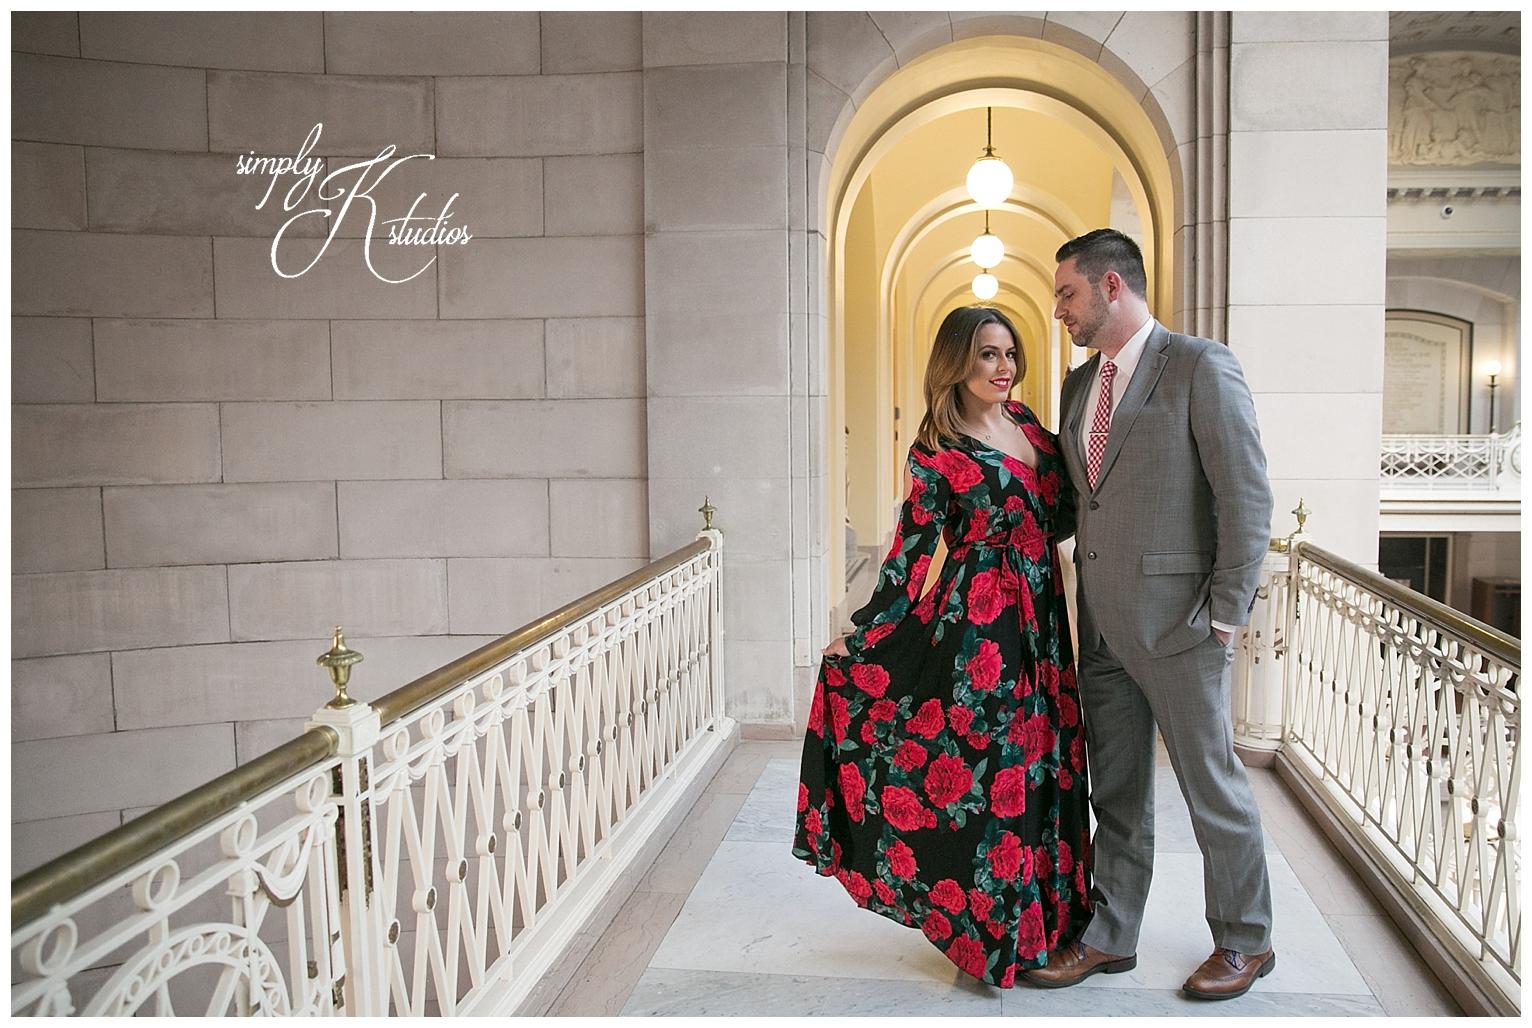 Wedding Planners in CT.jpg